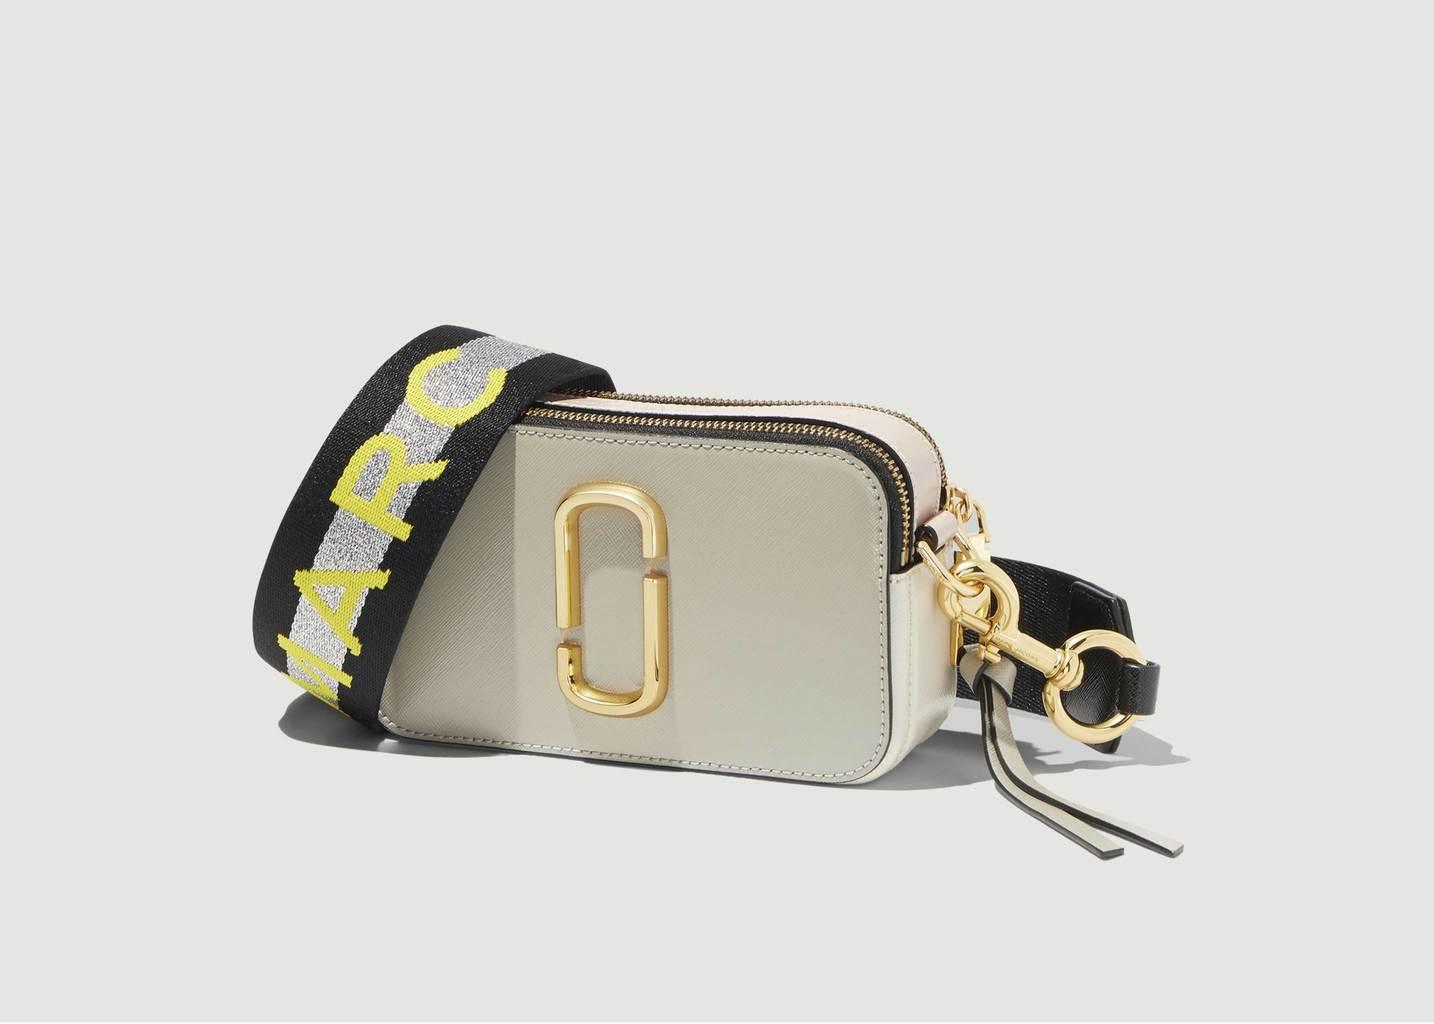 Sac The Logo Strap Snapshot Small Camera Bag - Marc Jacobs (THE)